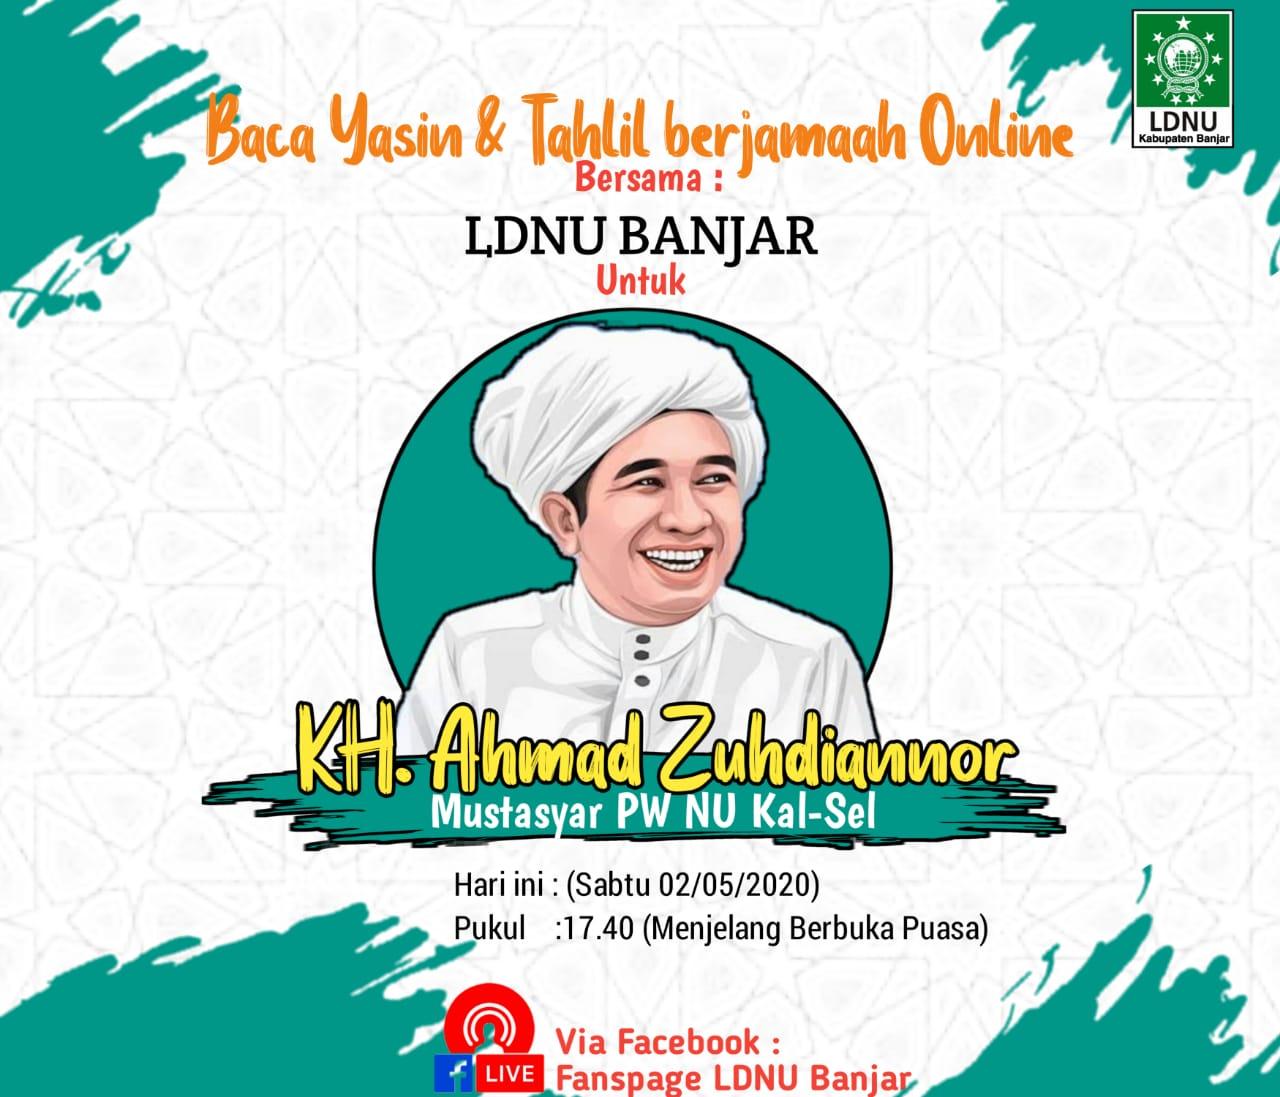 IMG 20200502 WA0030 - Tuan Guru Zuhdianor Wafat, LDNU Banjar Gelar Tahlilan Berjamaah Online